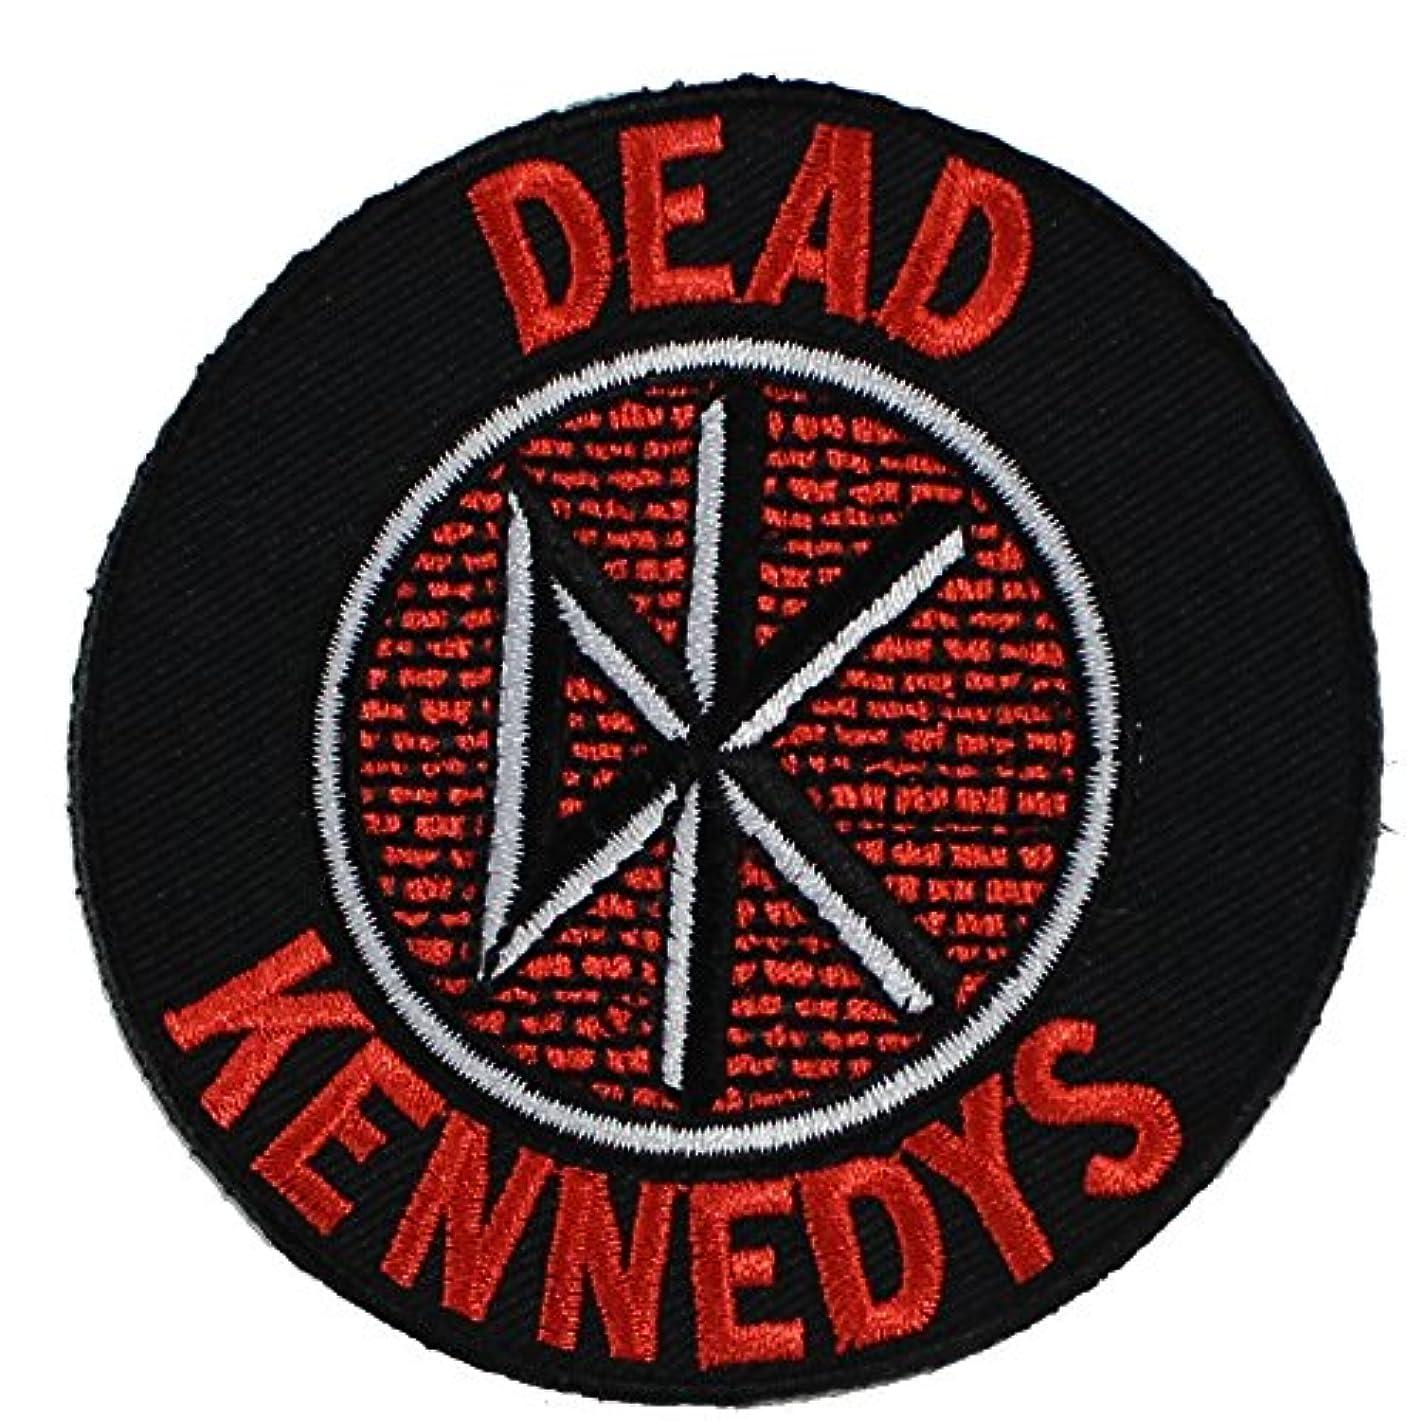 Application Dead Kennedys - Logo Patch